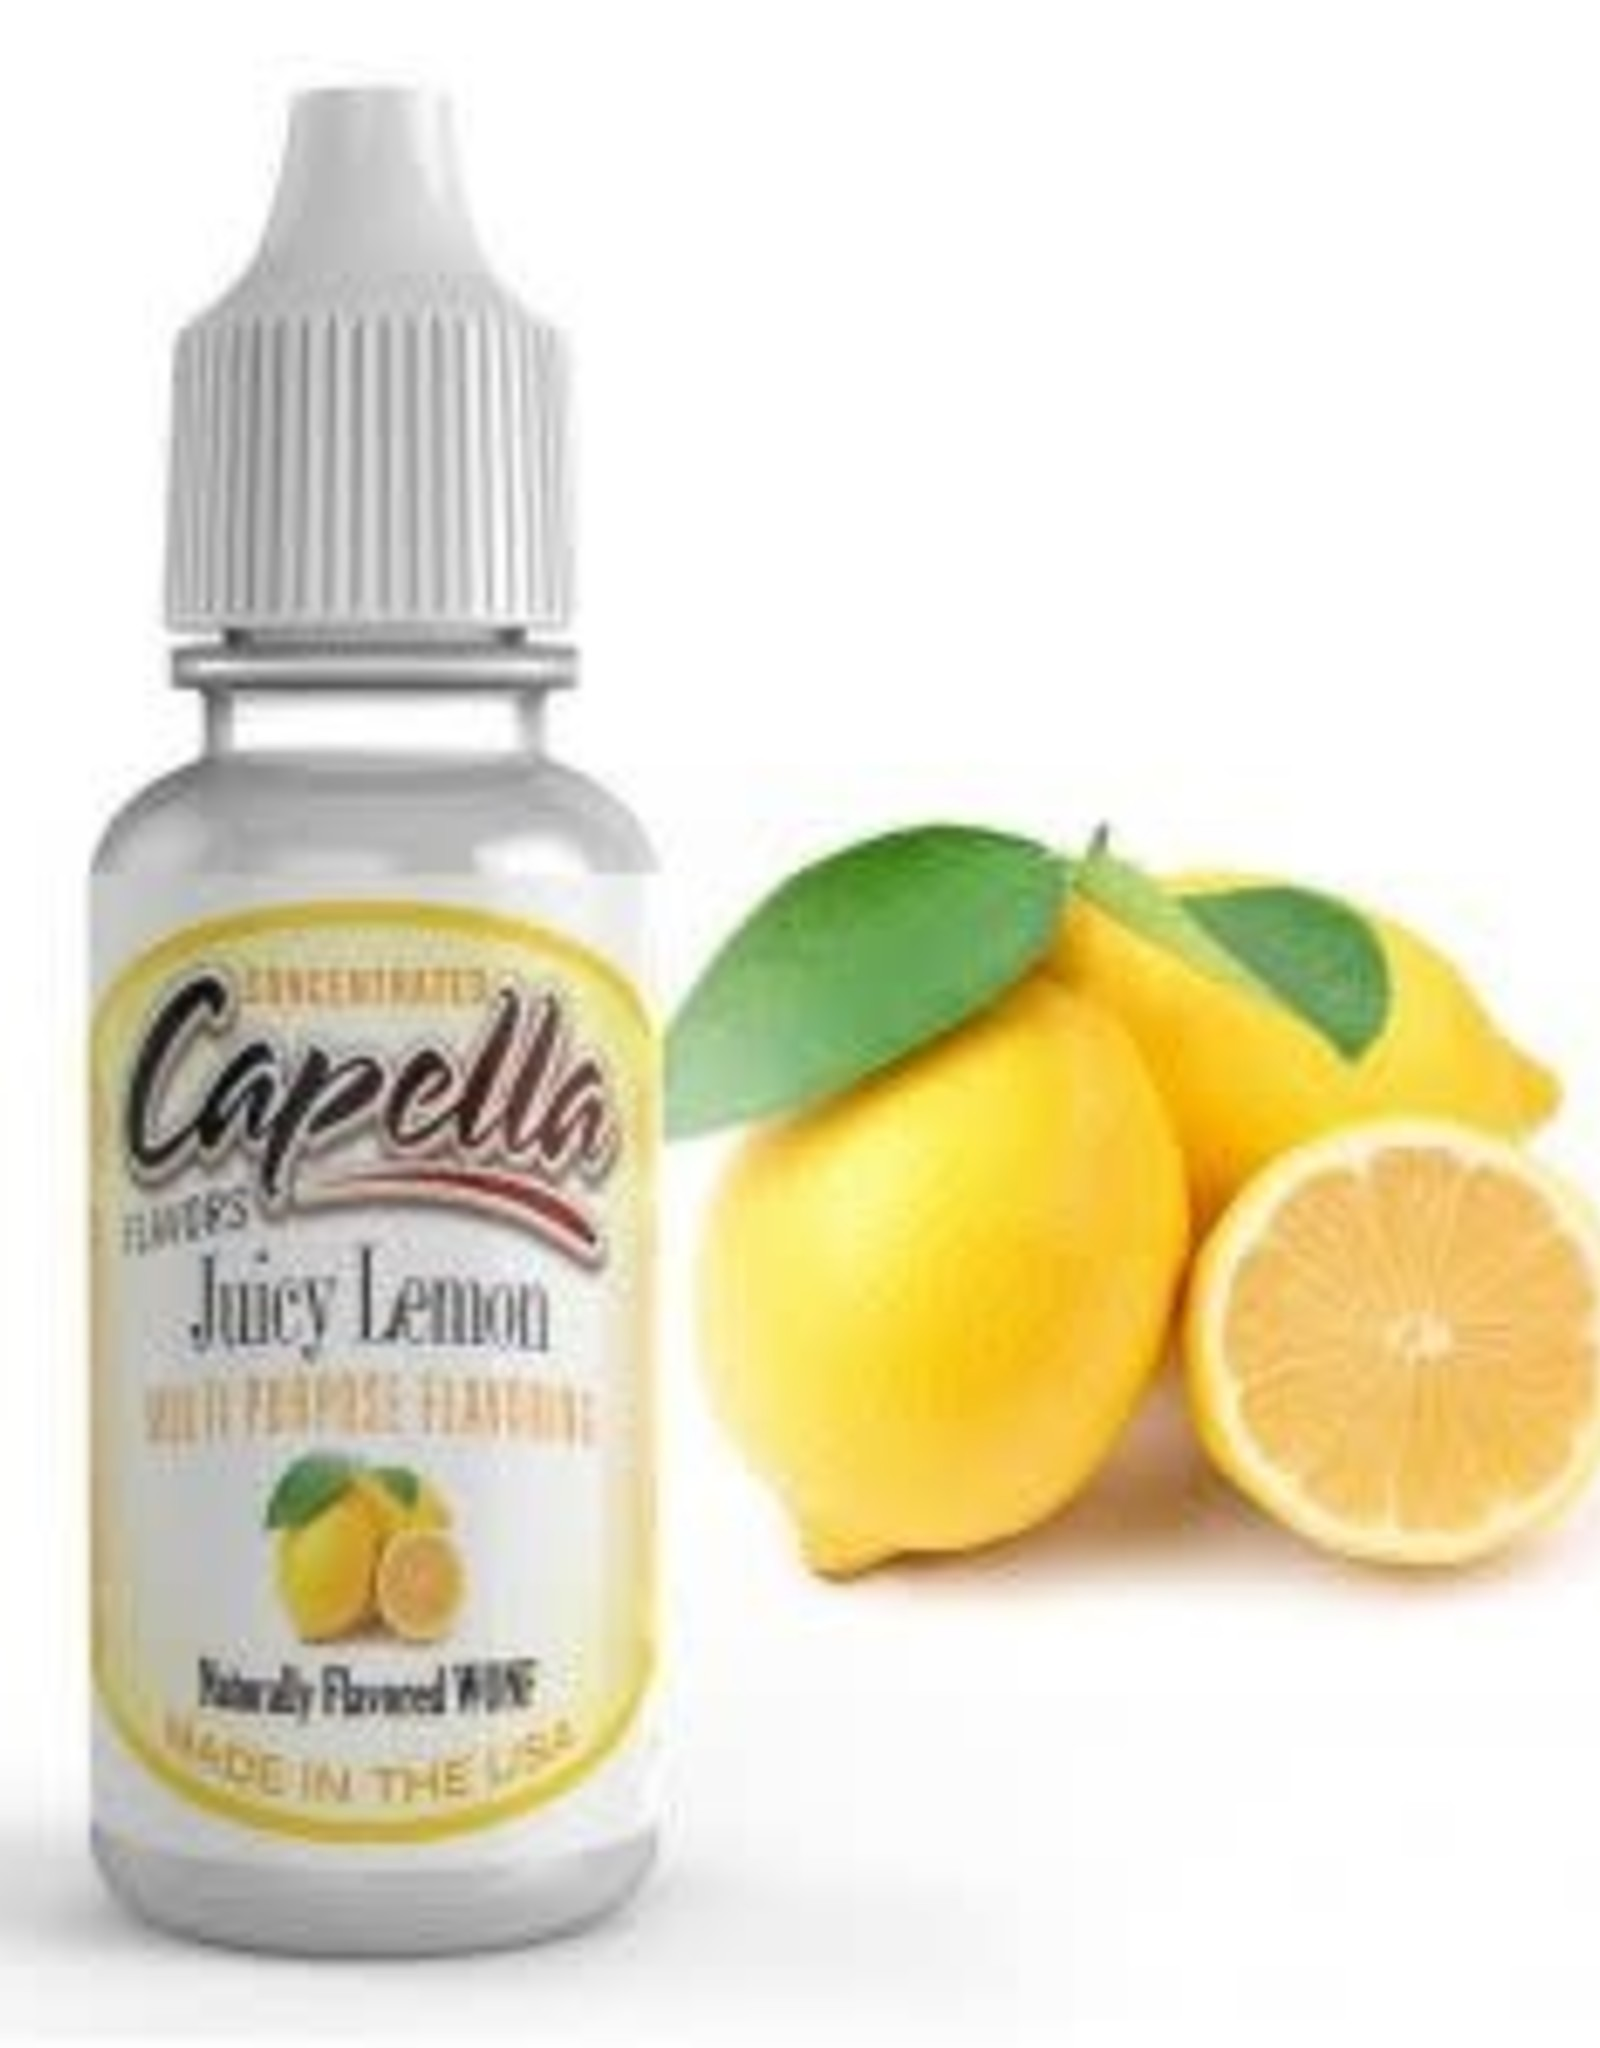 Capella Capella - Juicy Lemon Aroma 13ml